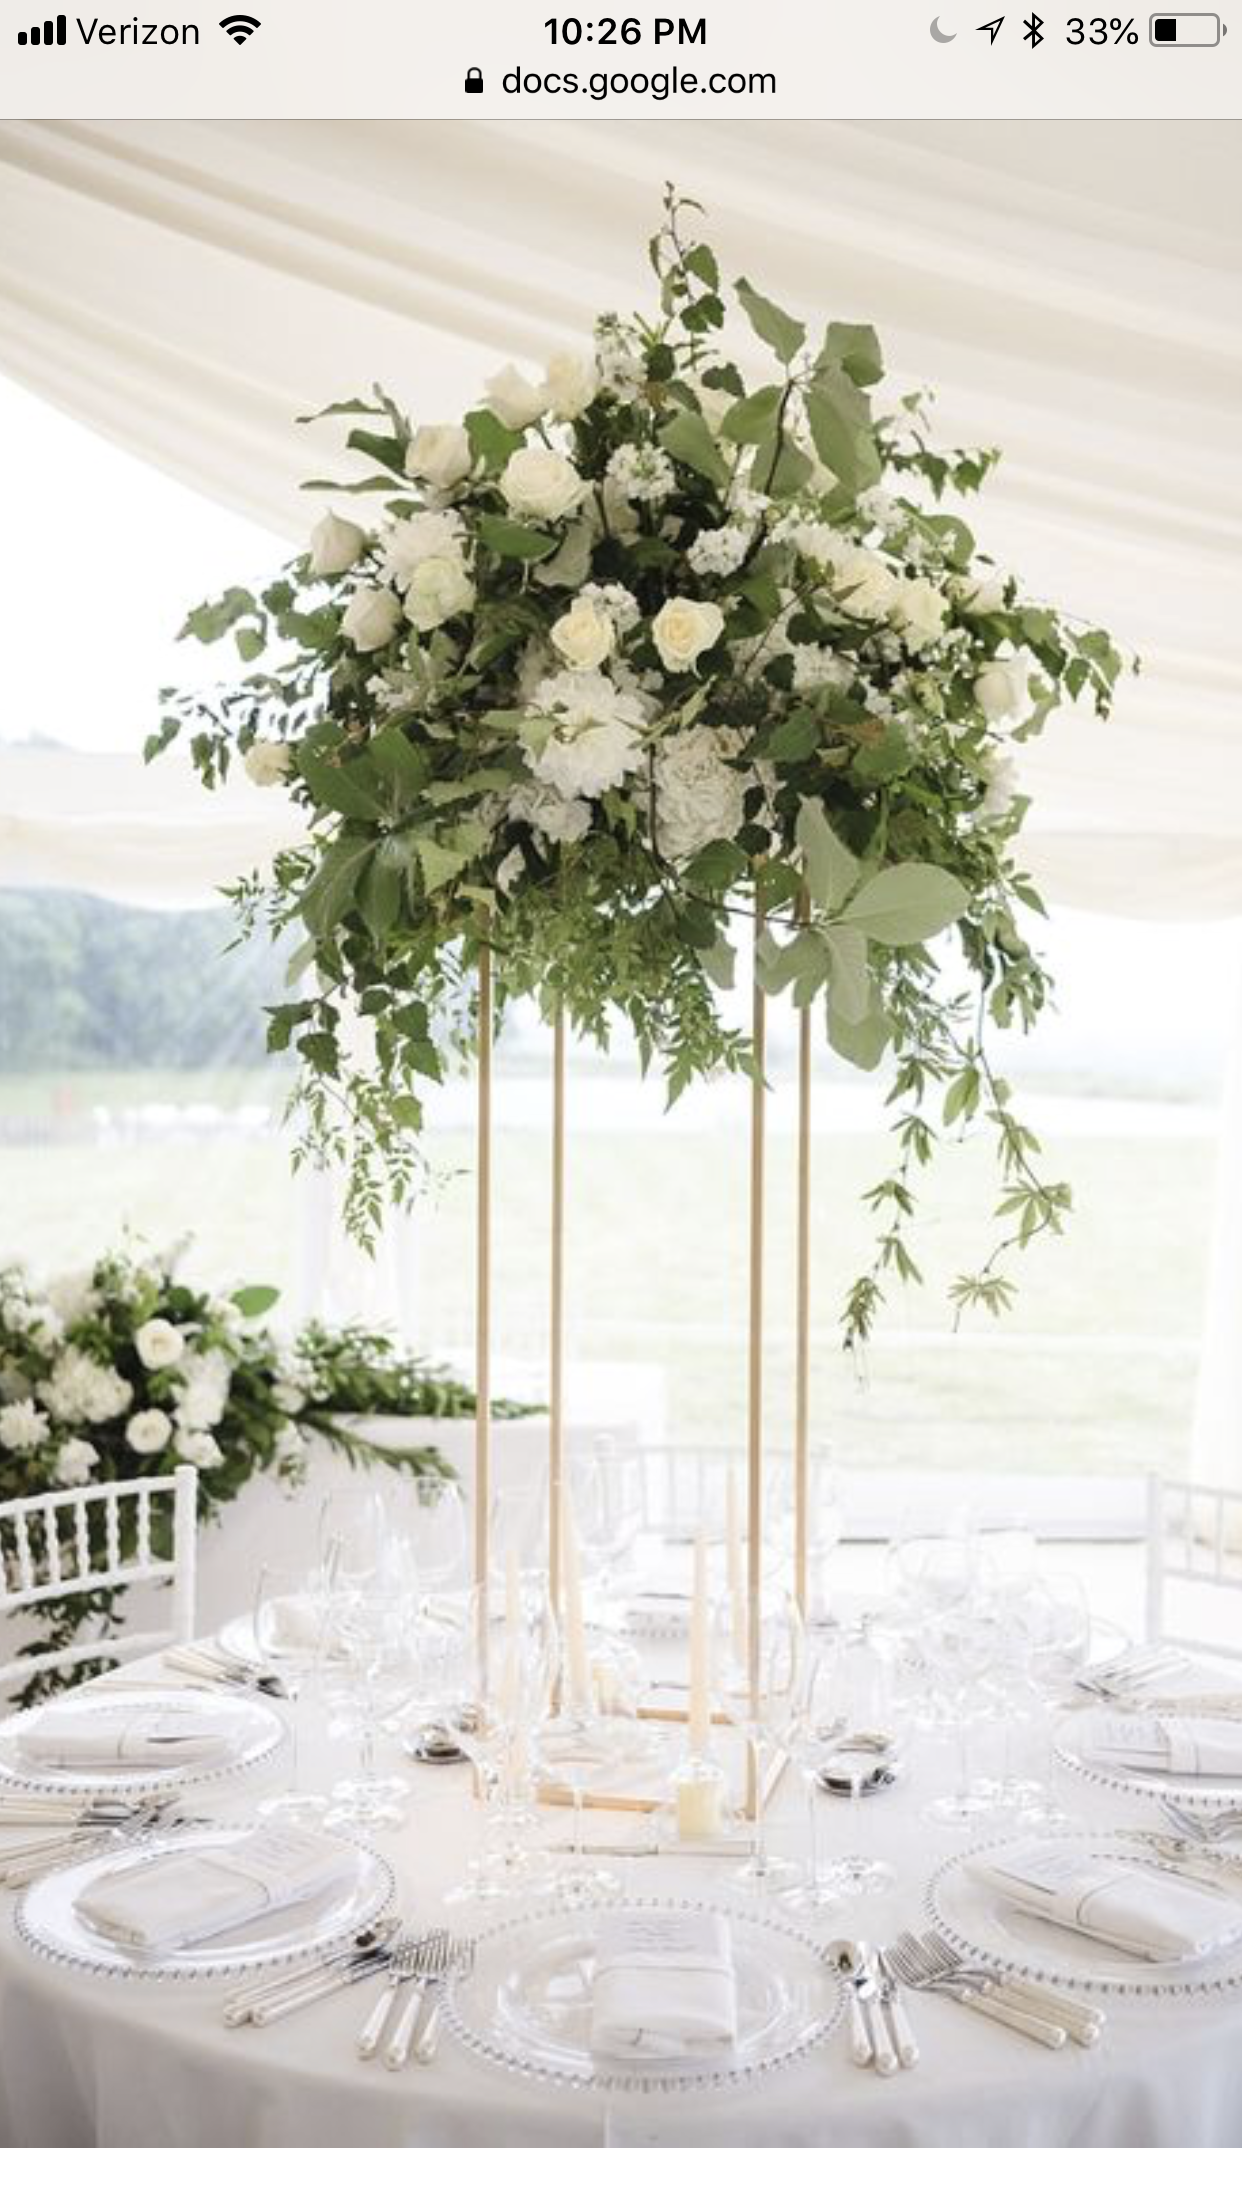 Round Table Centerpiece Inspiration | Frystock Wedding 7.27.2019 ...